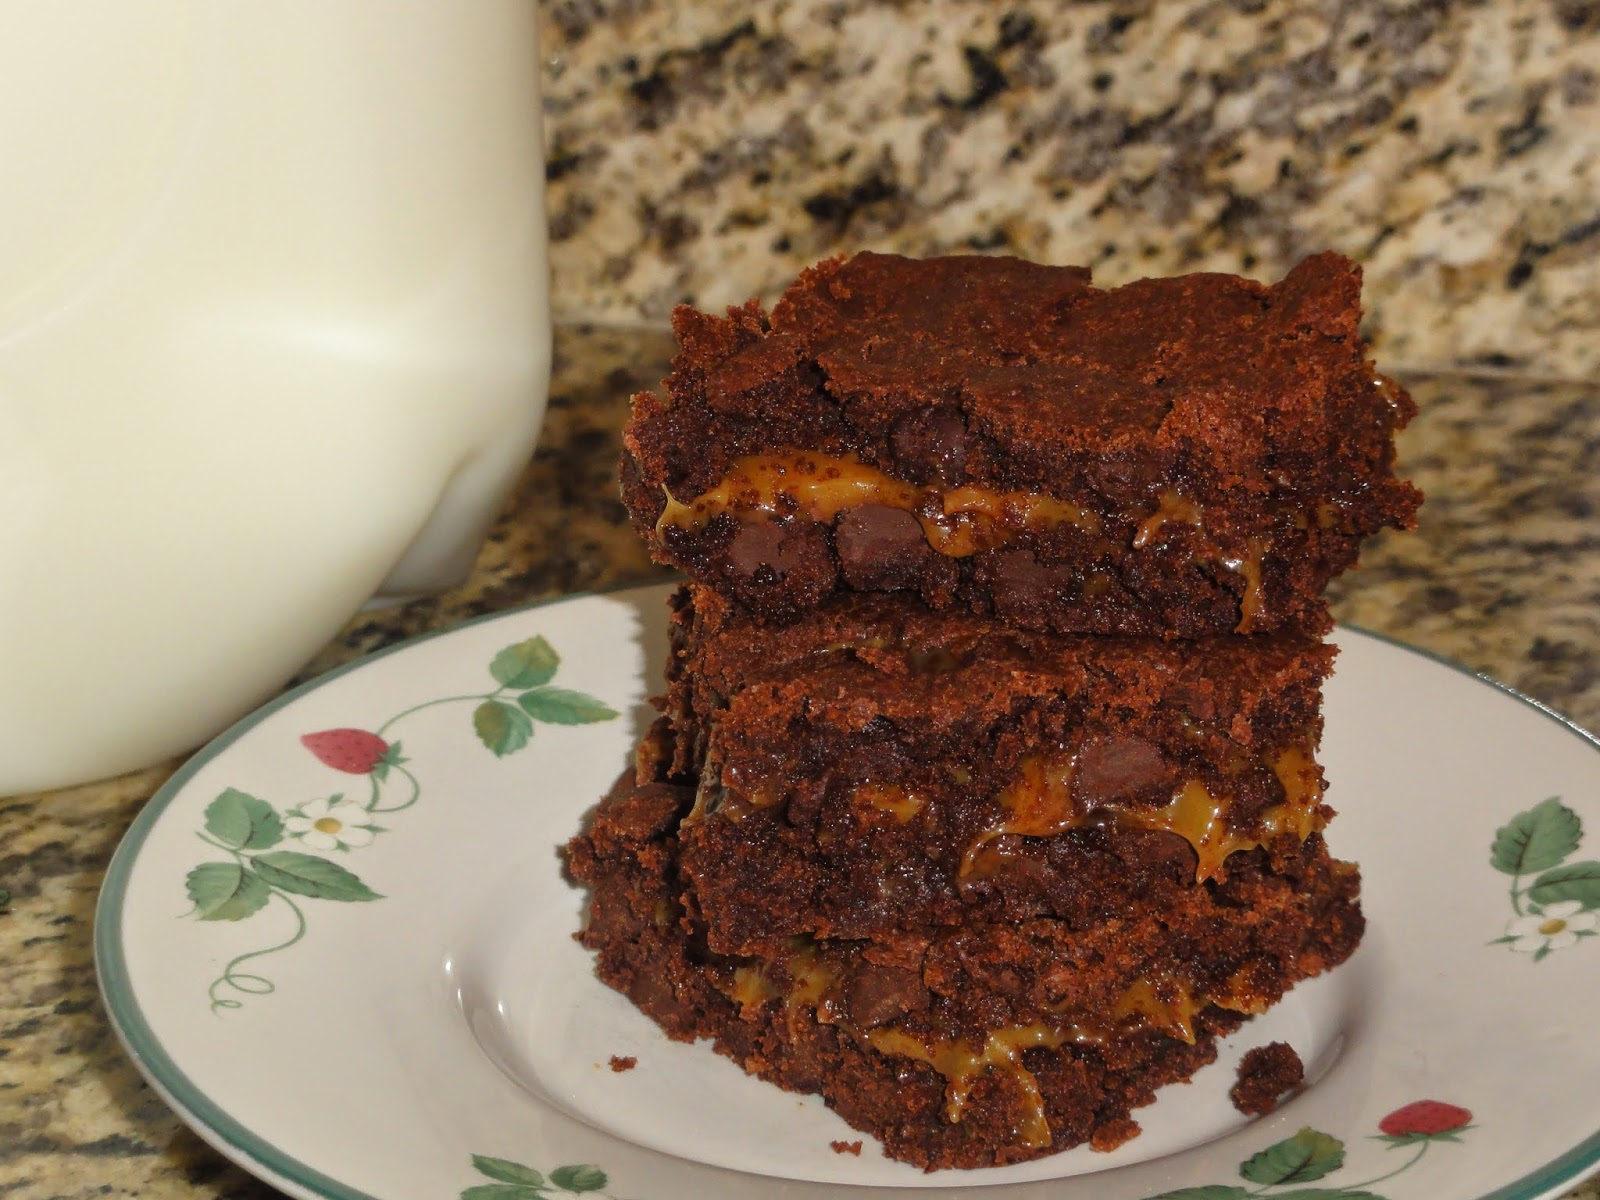 Hungry Hinton S Chocolate Cake